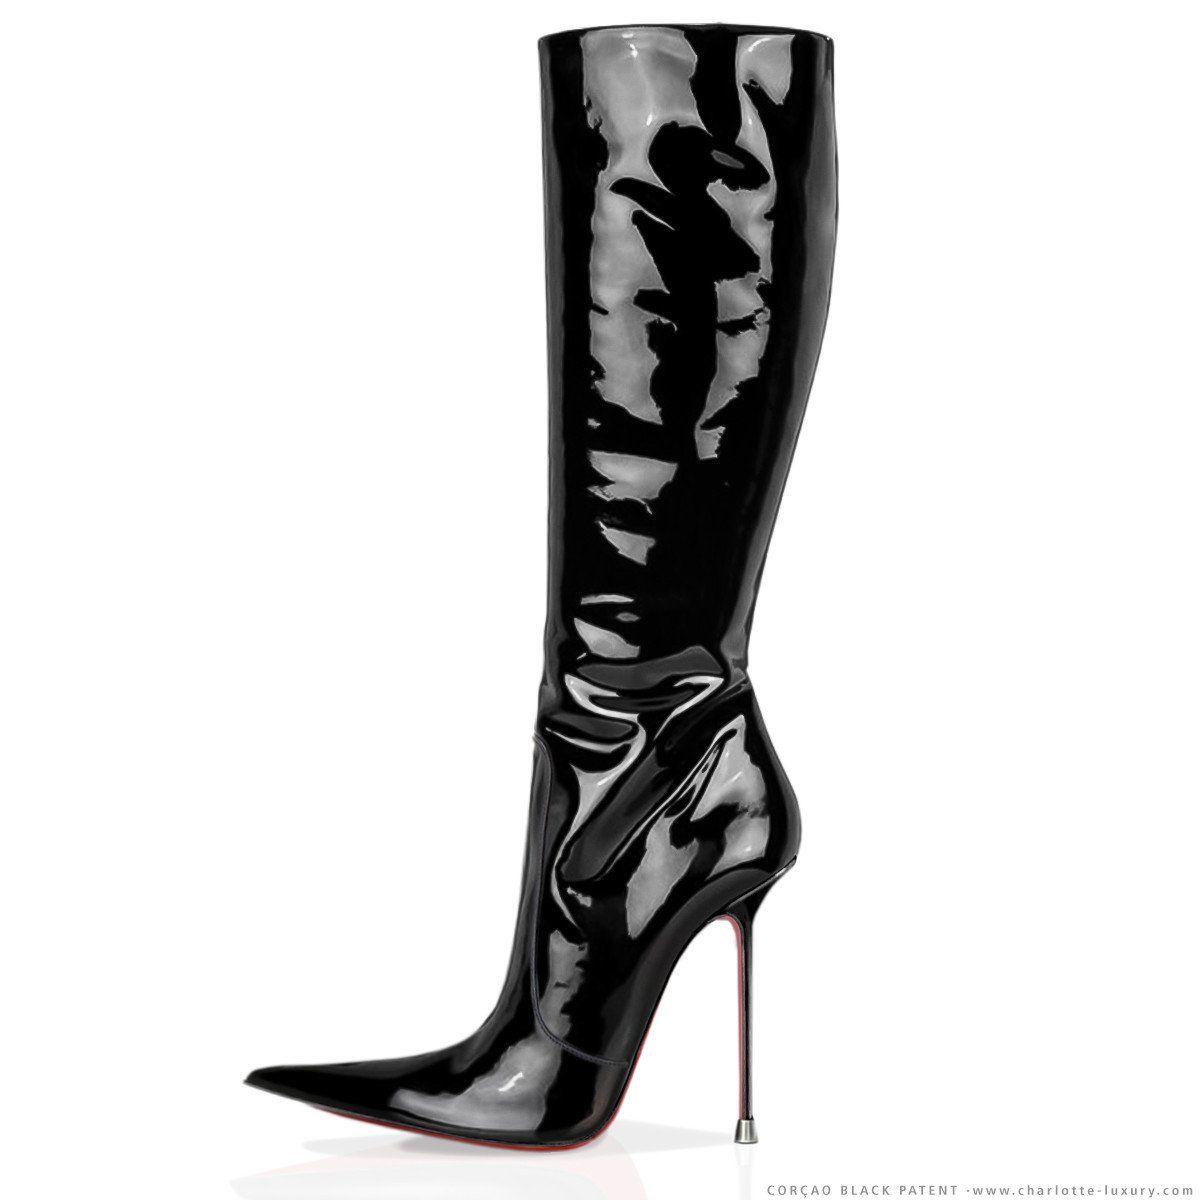 Corçao Black Patent · Charlotte Luxury Boots · Luxury High Heel Pointy Boots 81ade679c7